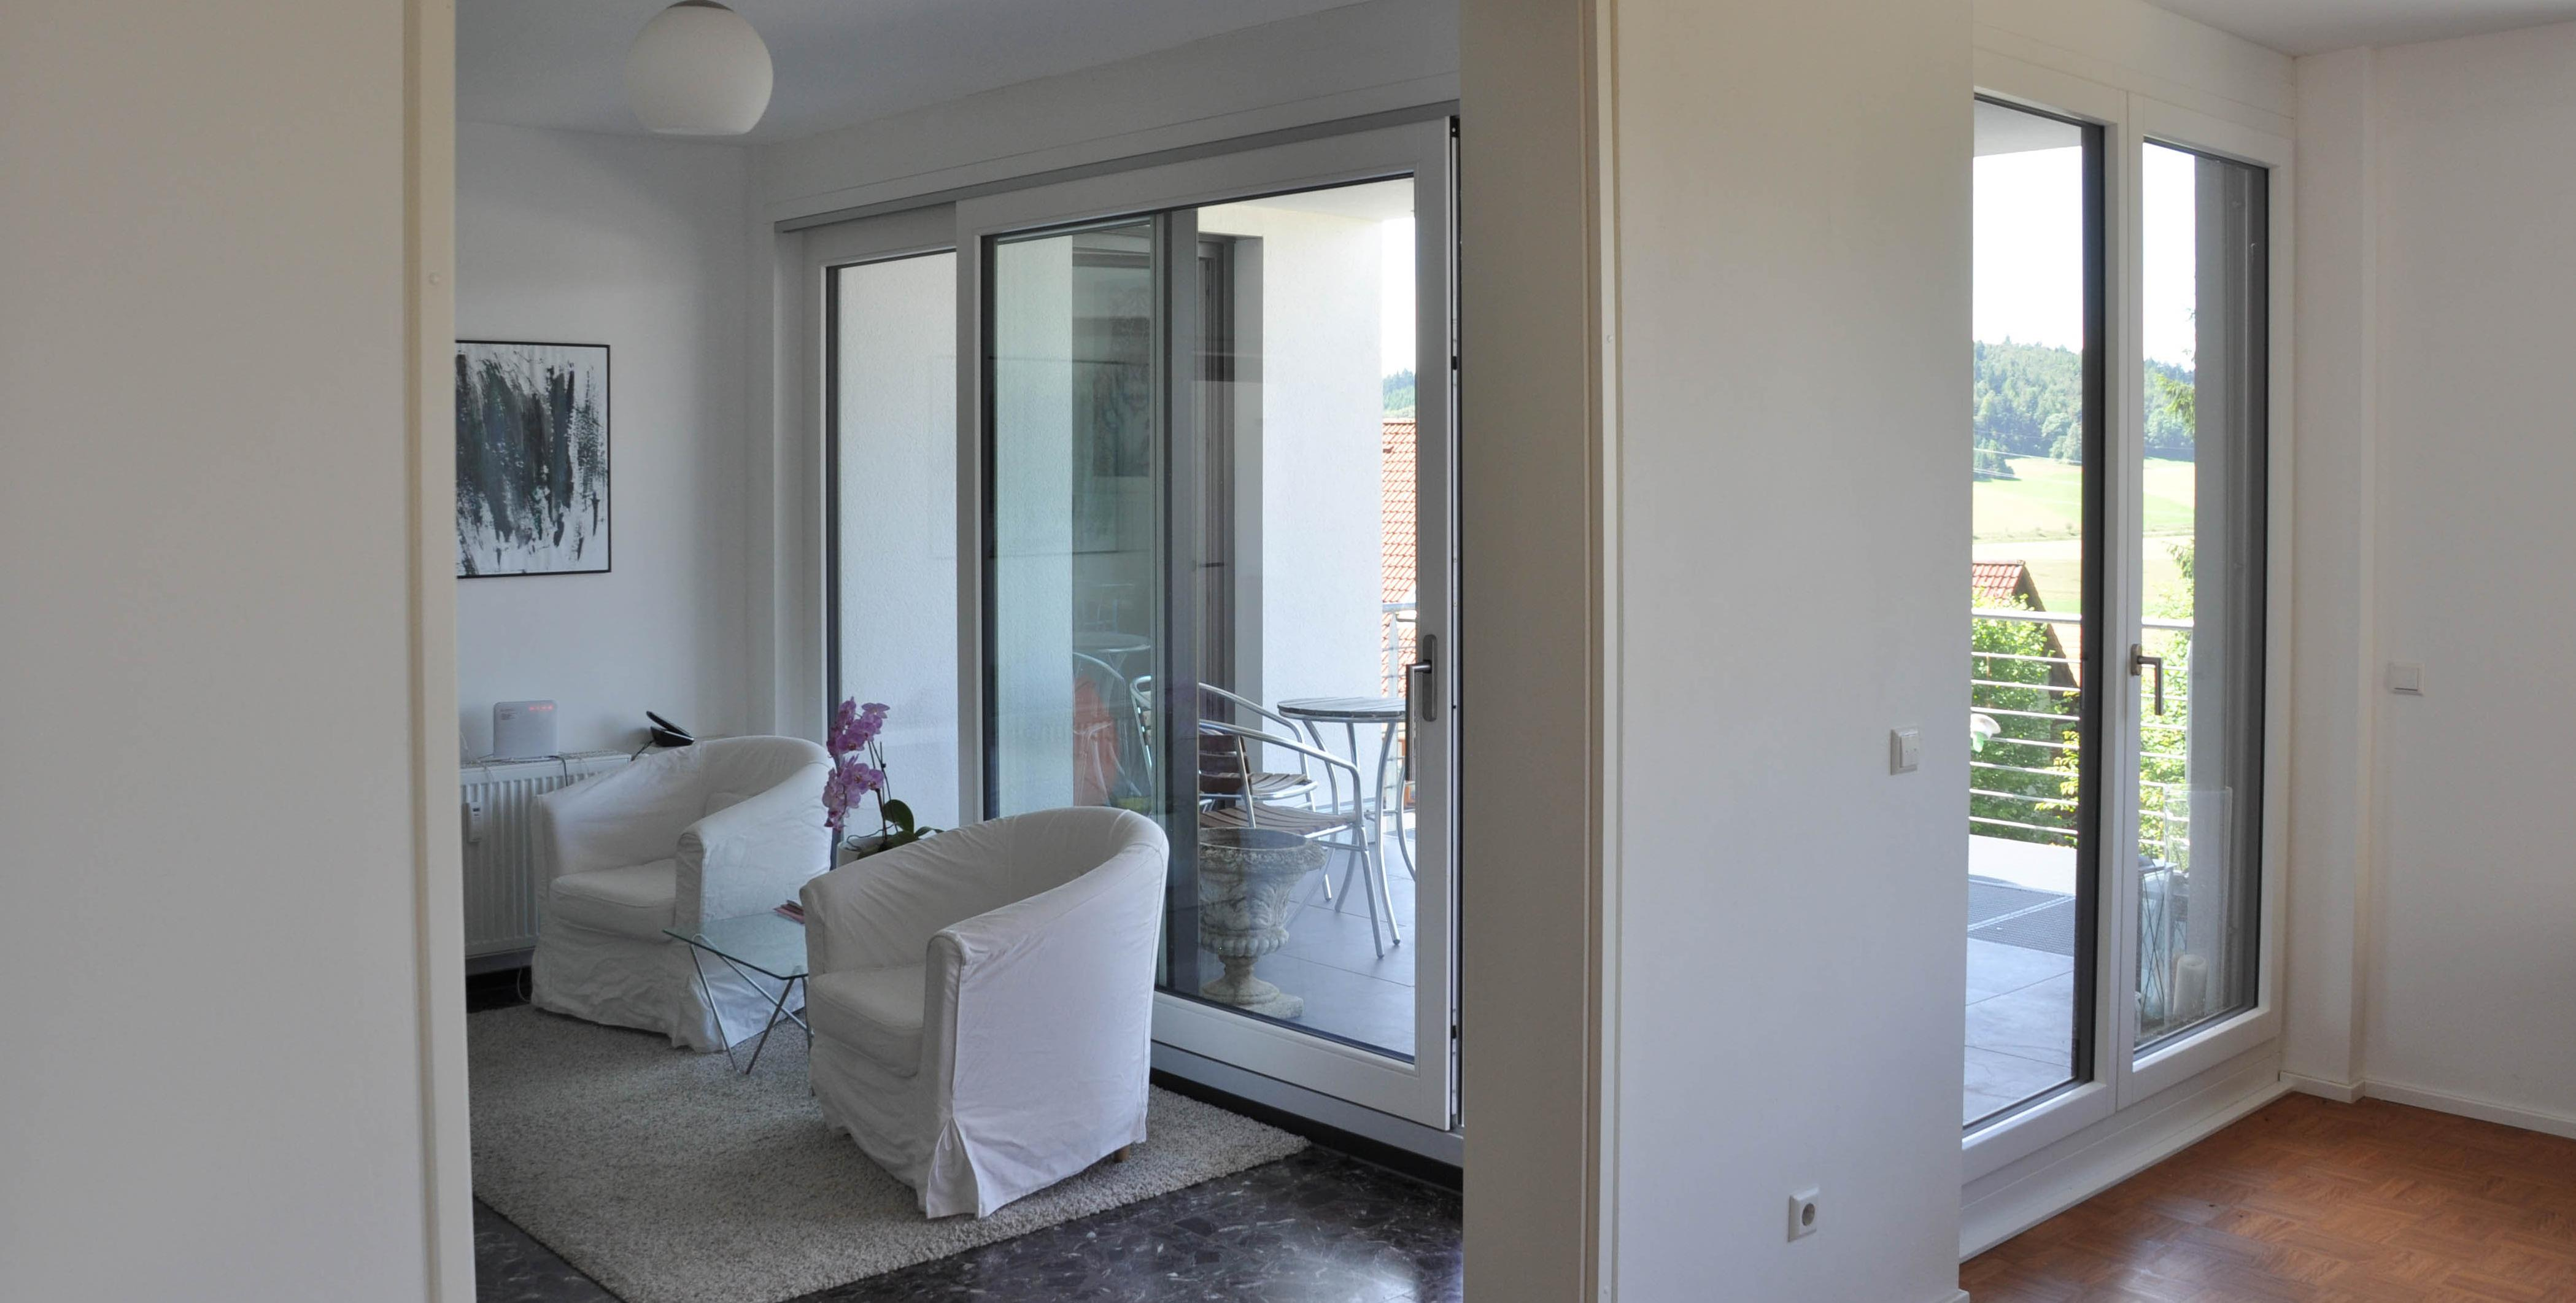 fensterbau wendler fensterbau wendler. Black Bedroom Furniture Sets. Home Design Ideas